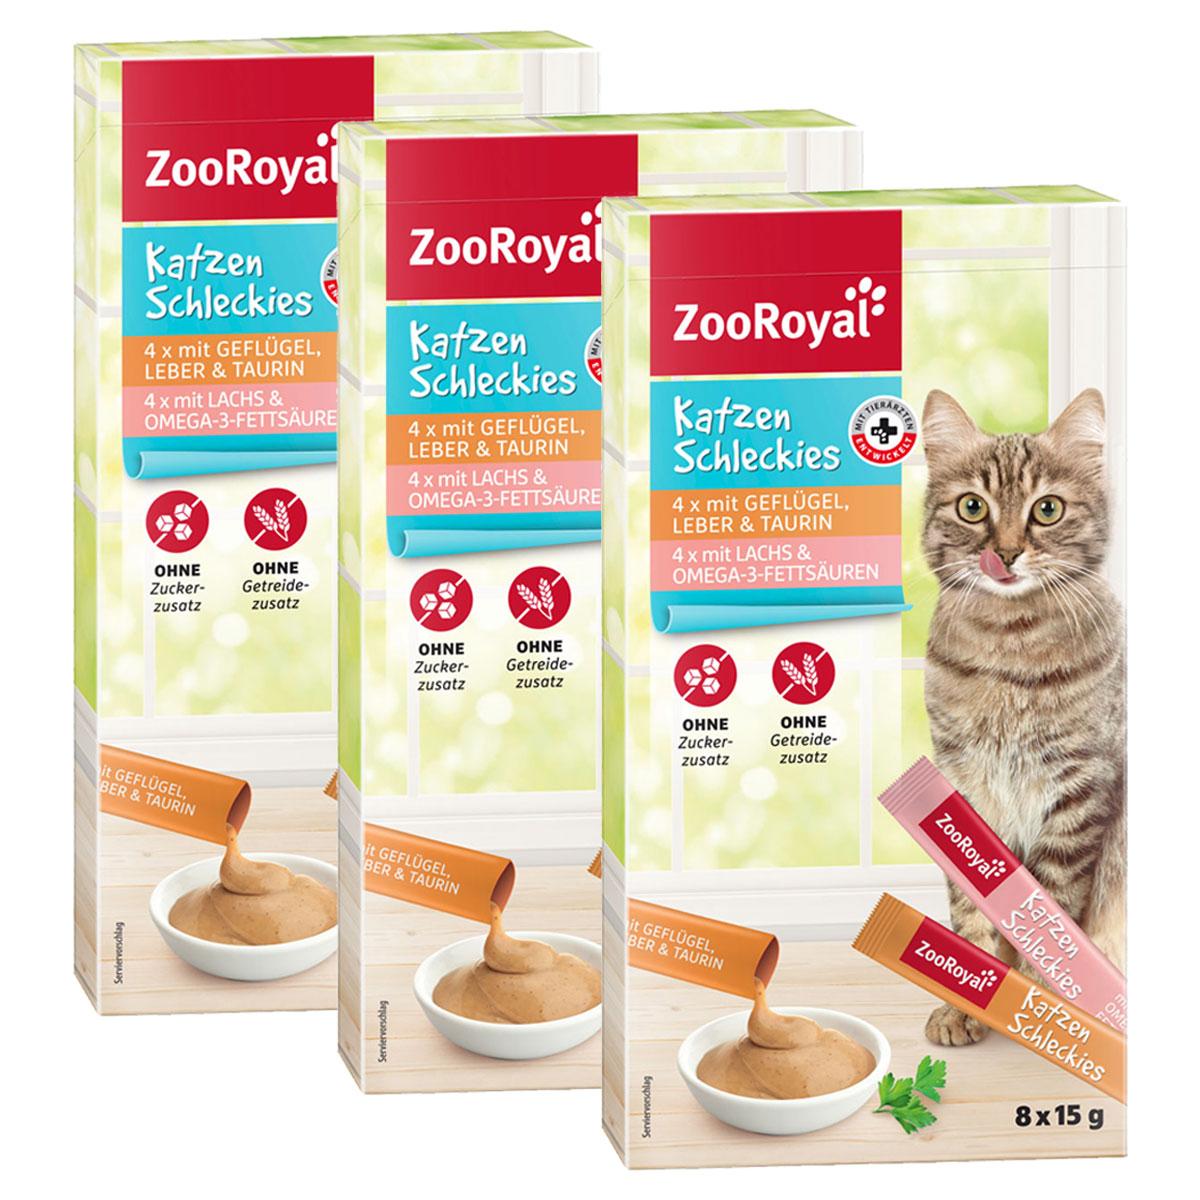 zooroyal katzen schleckies 3x8x15g g nstig kaufen bei zooroyal. Black Bedroom Furniture Sets. Home Design Ideas